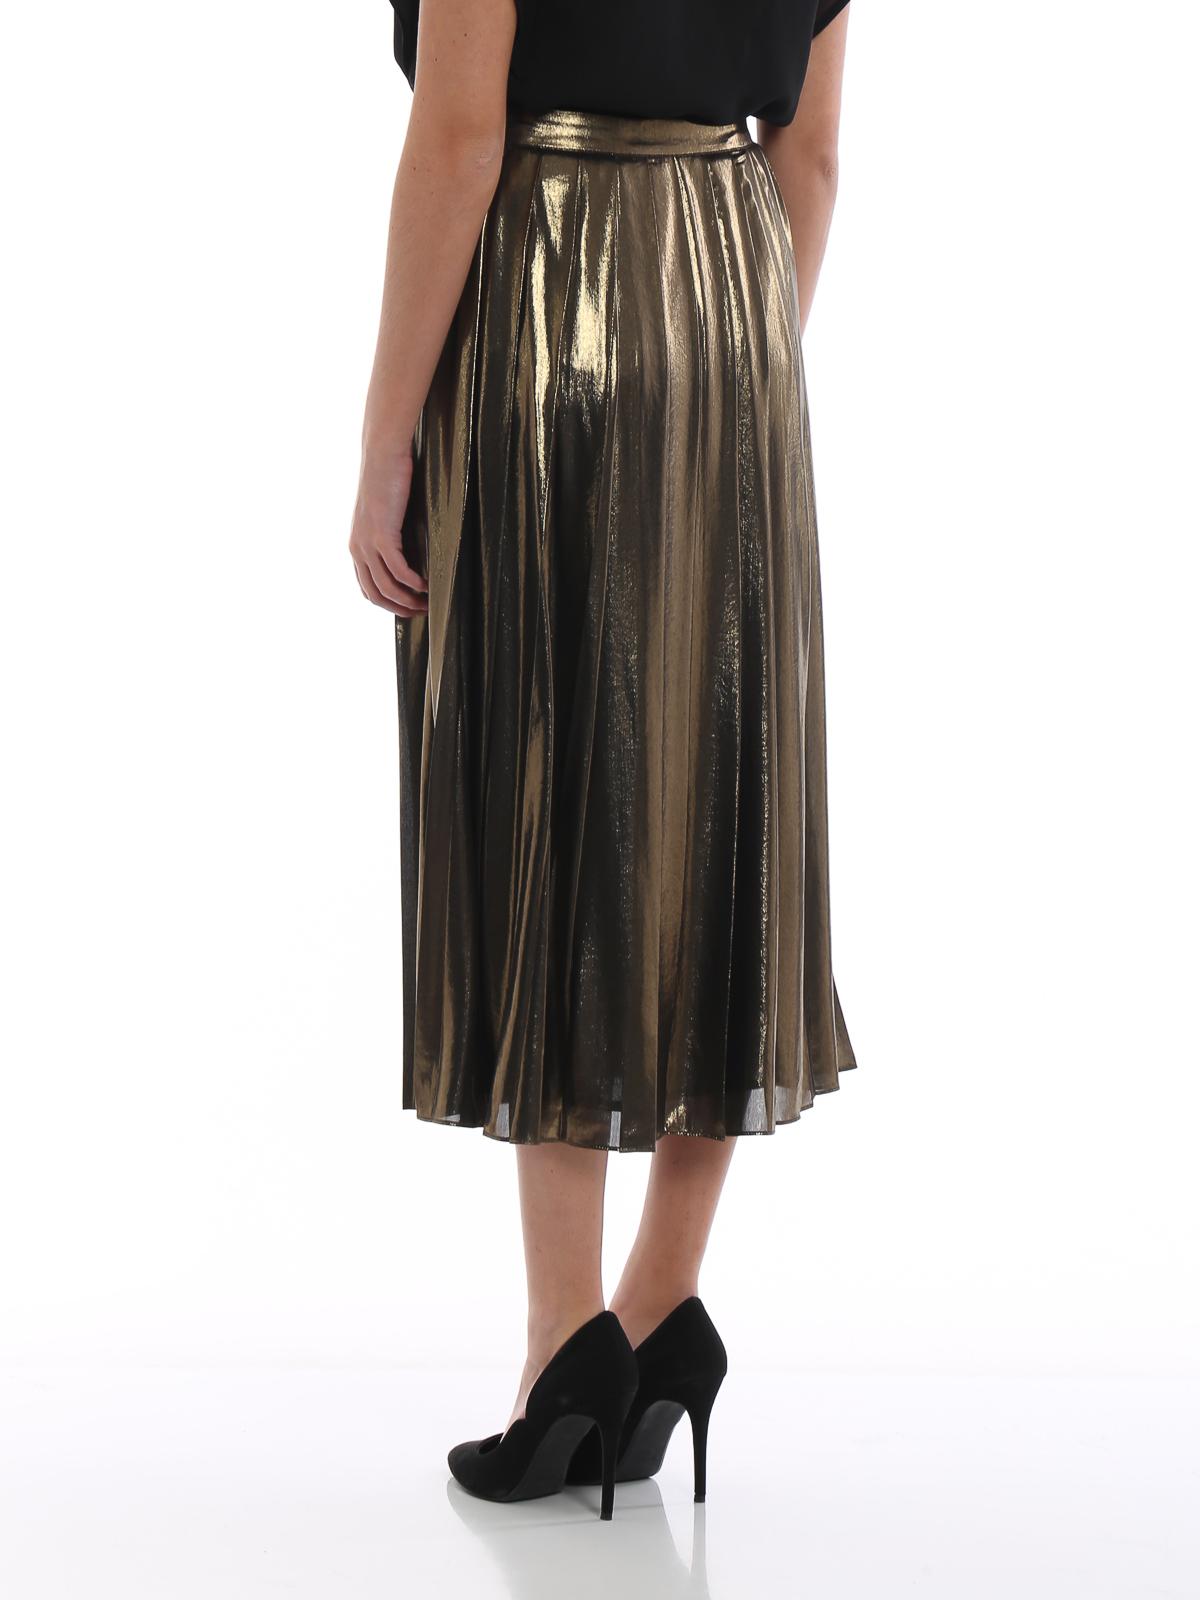 in vendita acd02 25e8d Michael Kors - Gonna plissettata lunga spalmata color oro ...